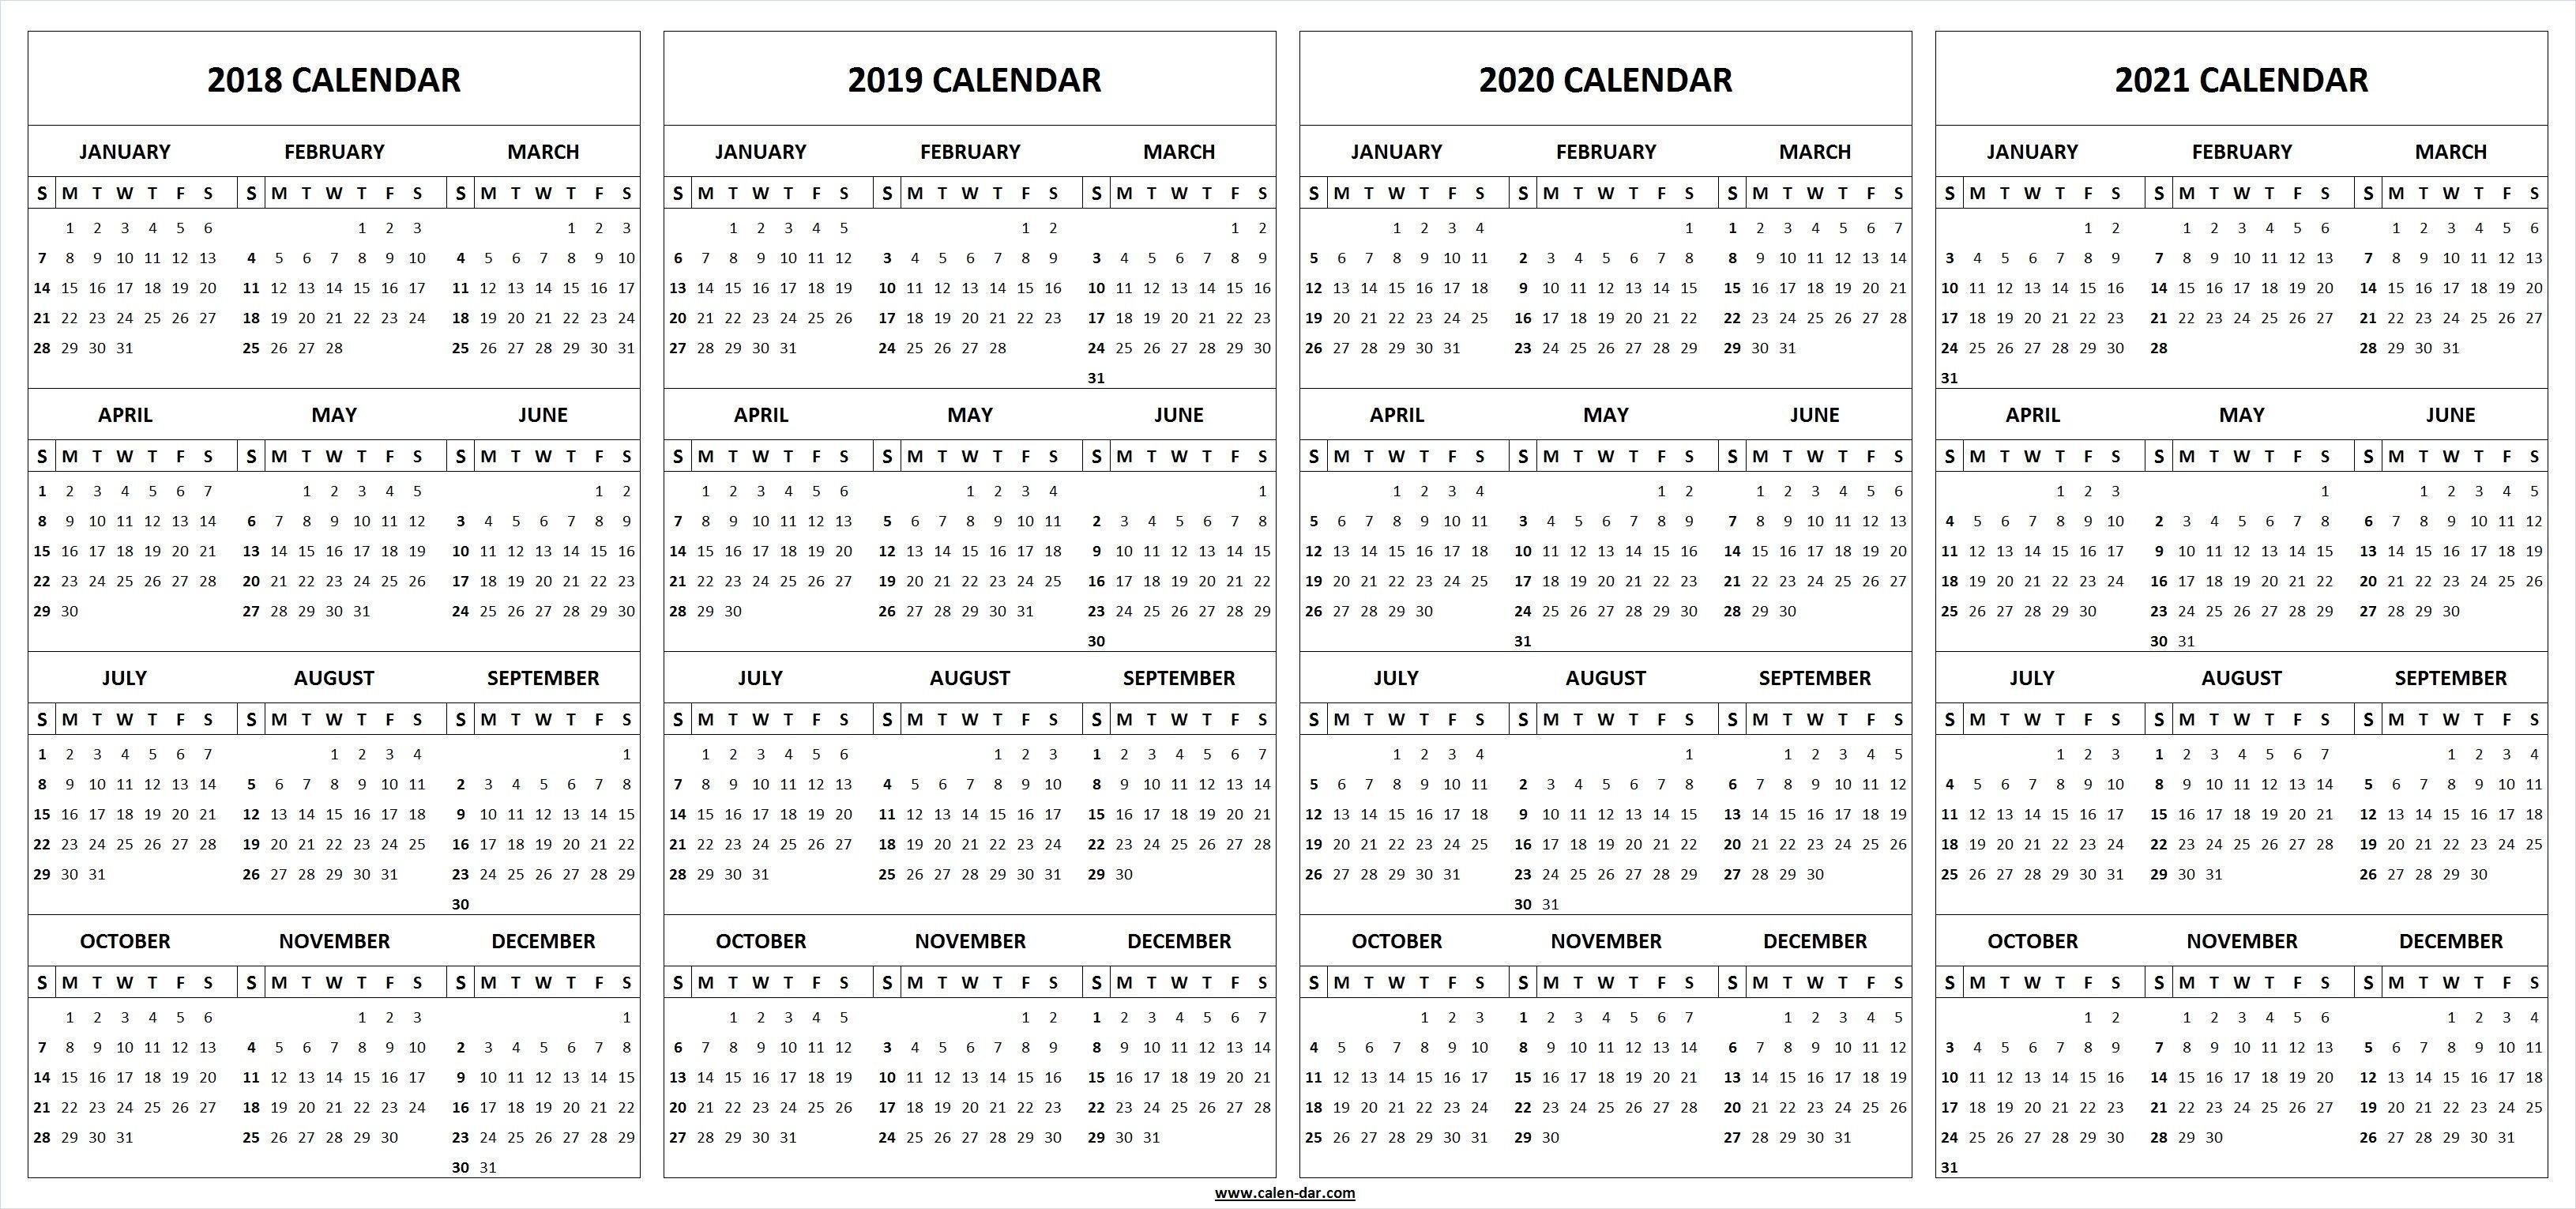 Printable 2018 2019 2020 2021 Calendar Template | Альбомы 4 Year Printable Calendar